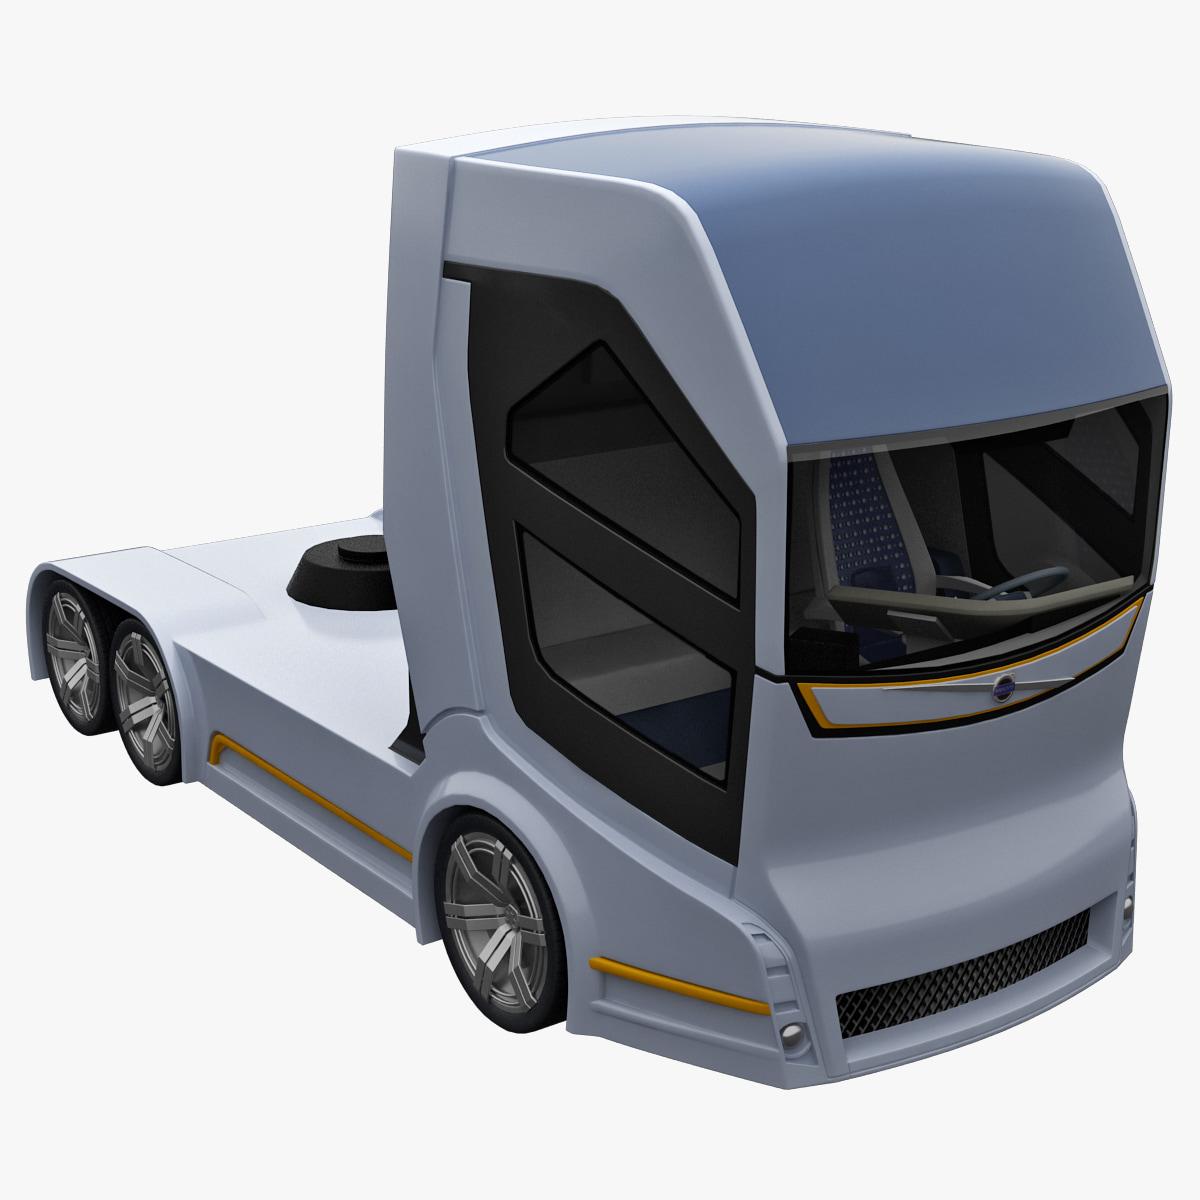 Volvo_Vision_2020_max_0002.jpg